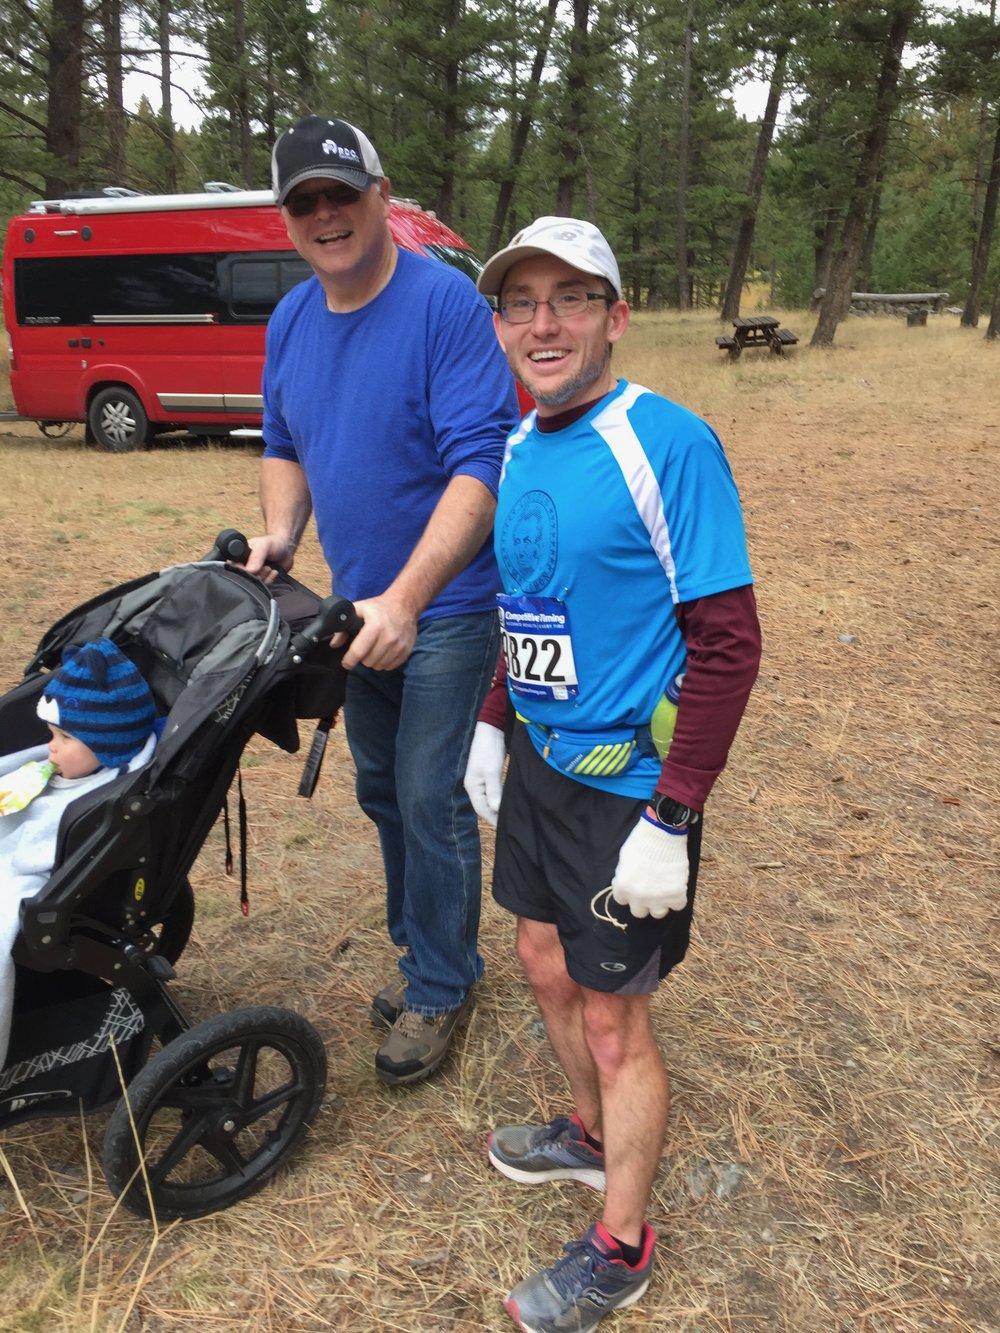 foys to blacktail trails trail marathon ftbtIMG_1069.JPG